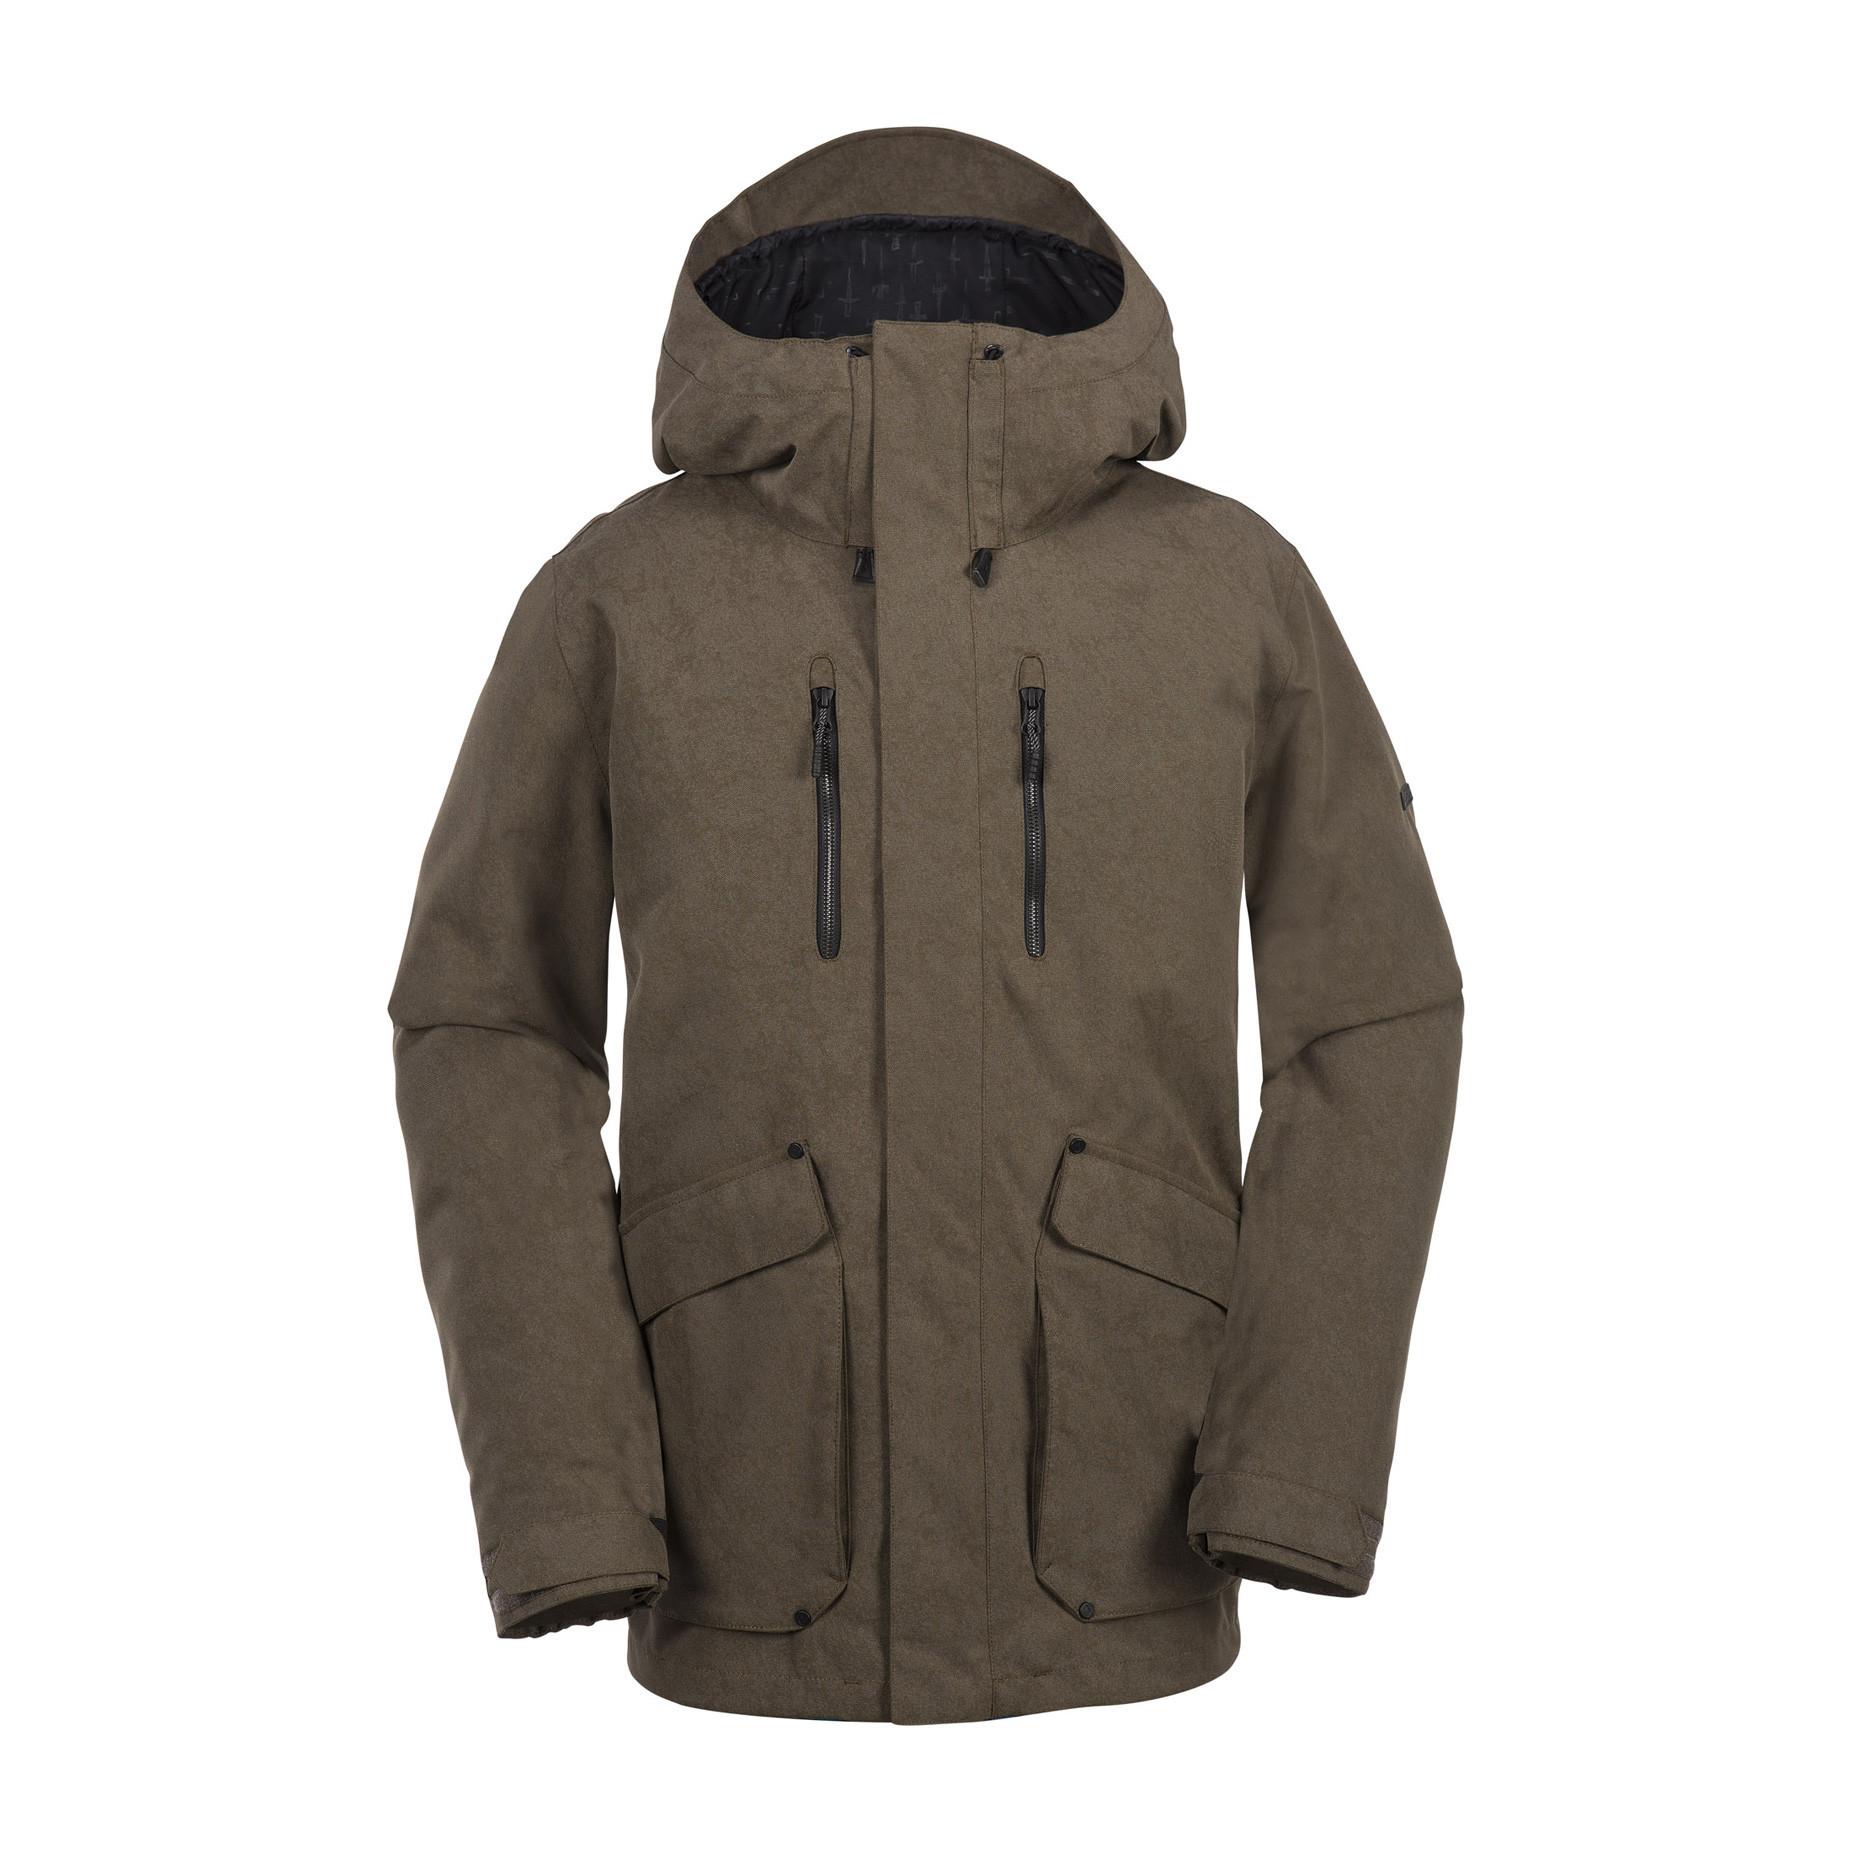 Snowboard jacket sale sydney